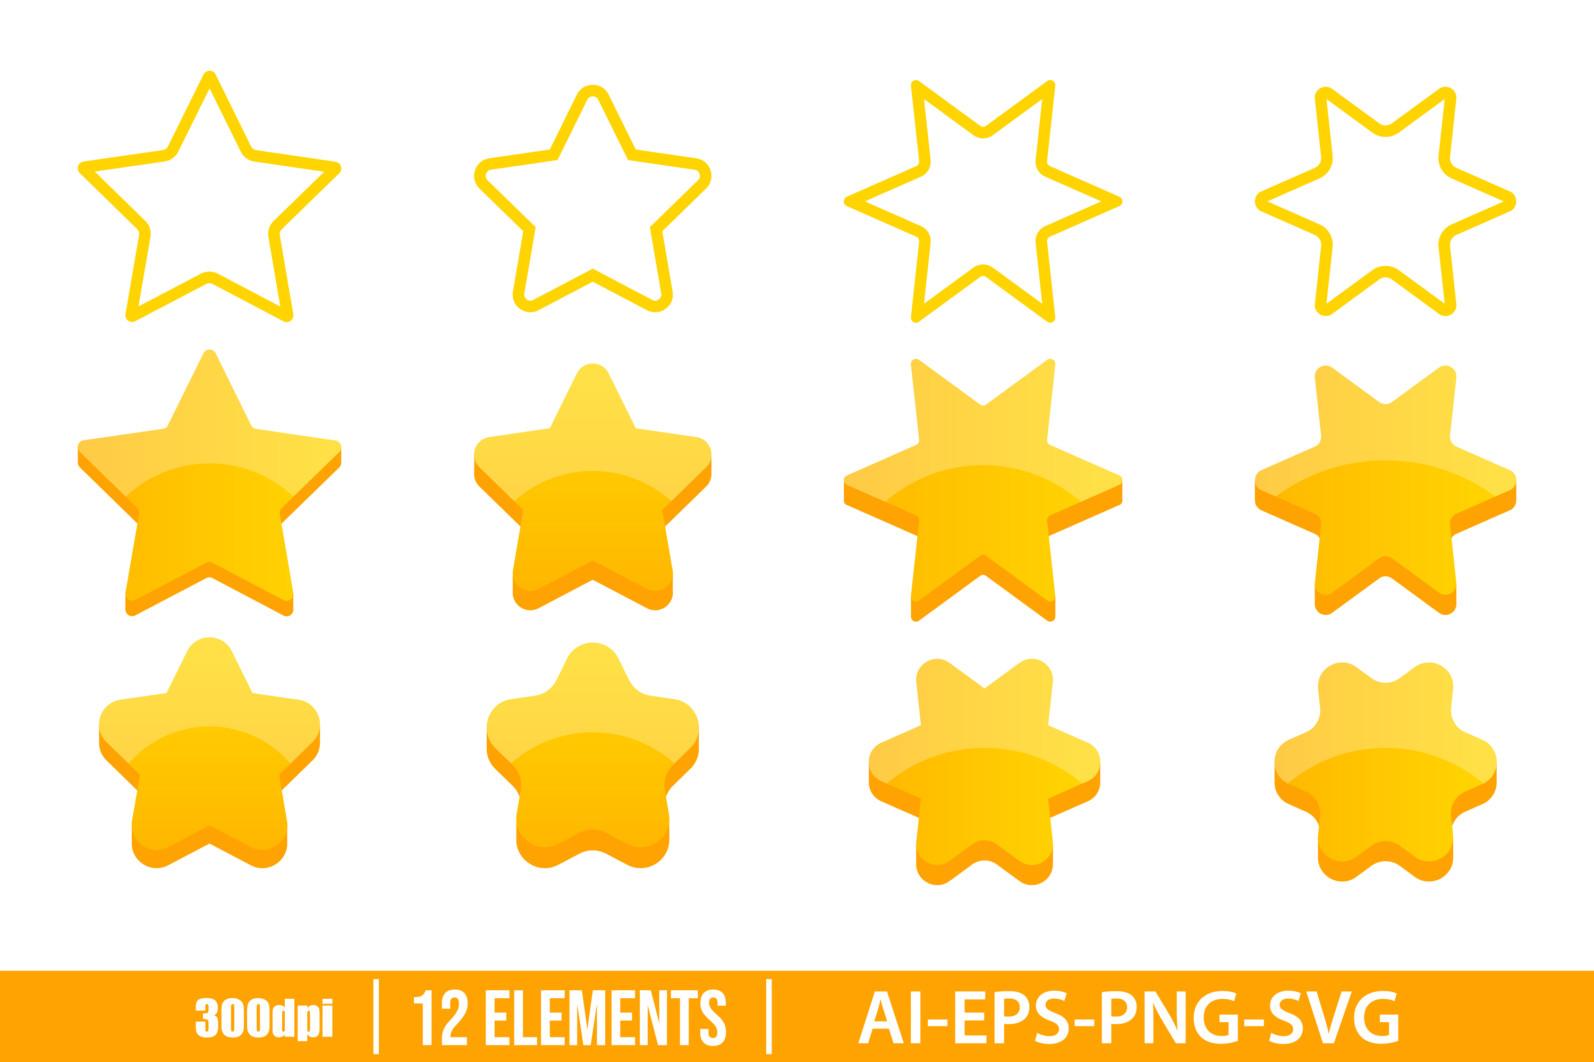 Golden stars clipart vector design illustration. Gold, stars, icon, vote set. Vector Clipart Print - GOLDEN STARS scaled -